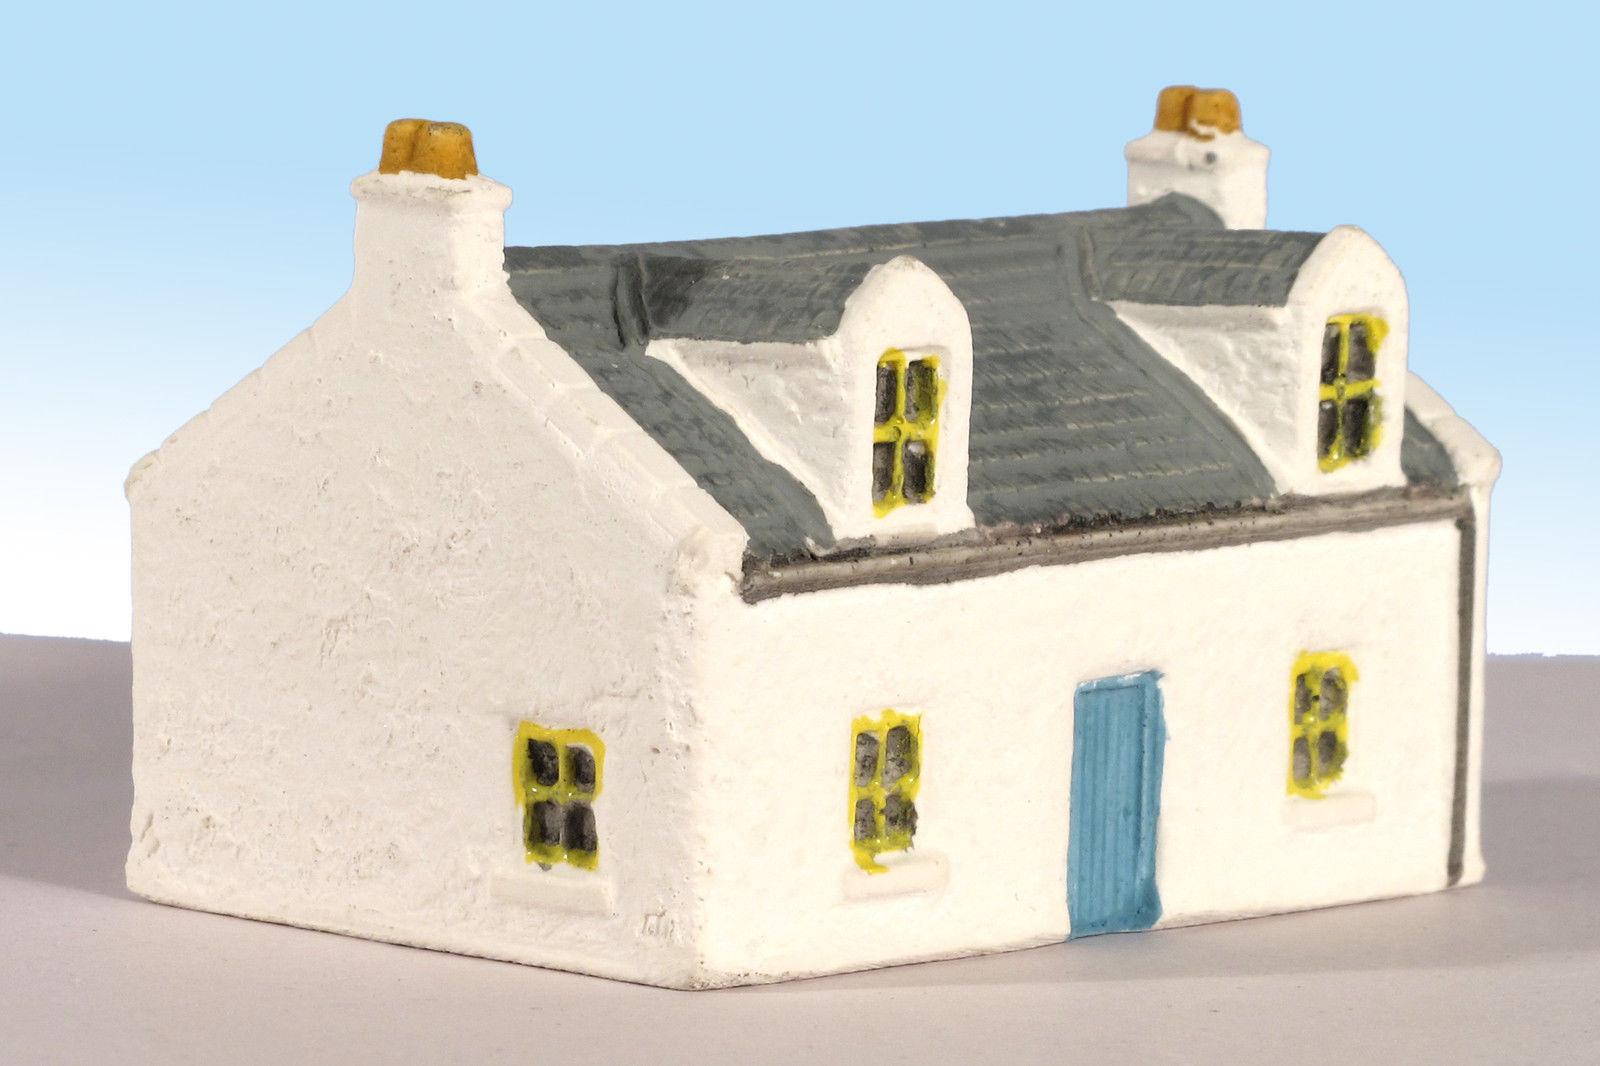 Harburn Hamlet HN612 Country Cottage with Dormer Windows Grey Roof 'N'  Gauge New